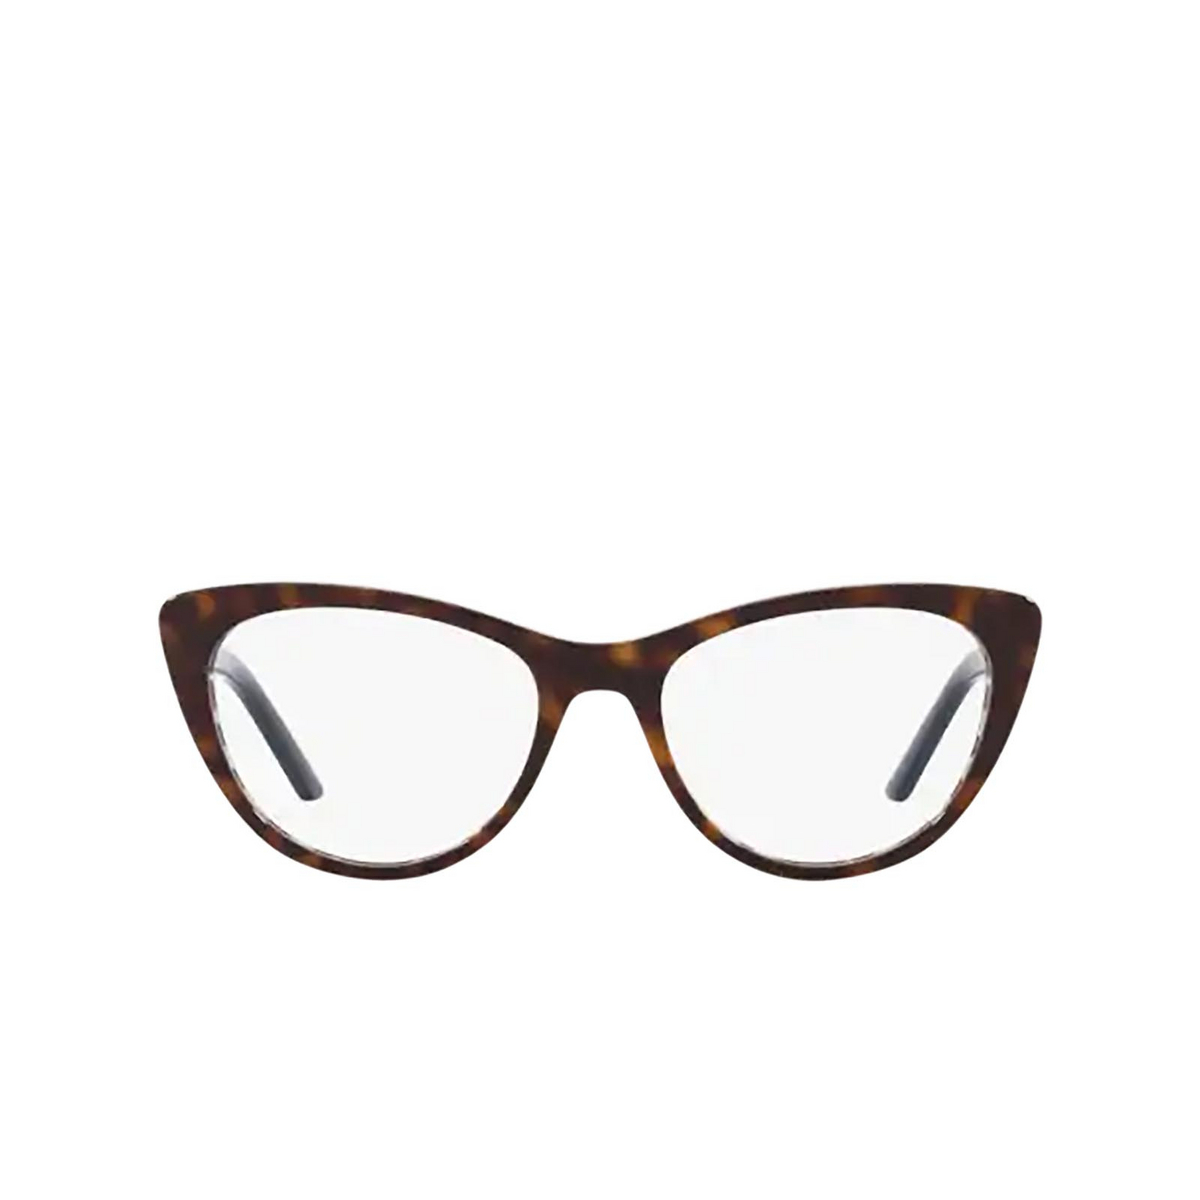 Prada® Cat-eye Eyeglasses: PR 05XV color Havana / Blue Chess 5121O1.